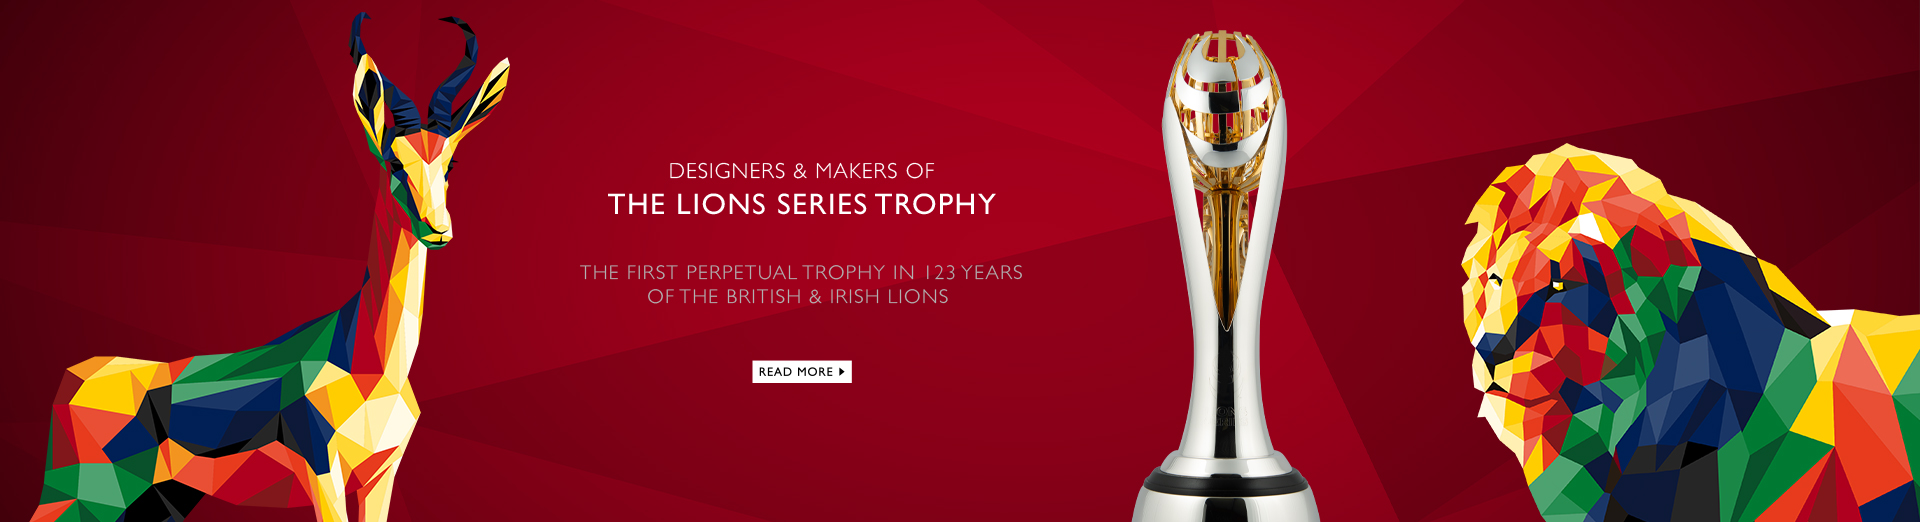 Lions Series Trophy